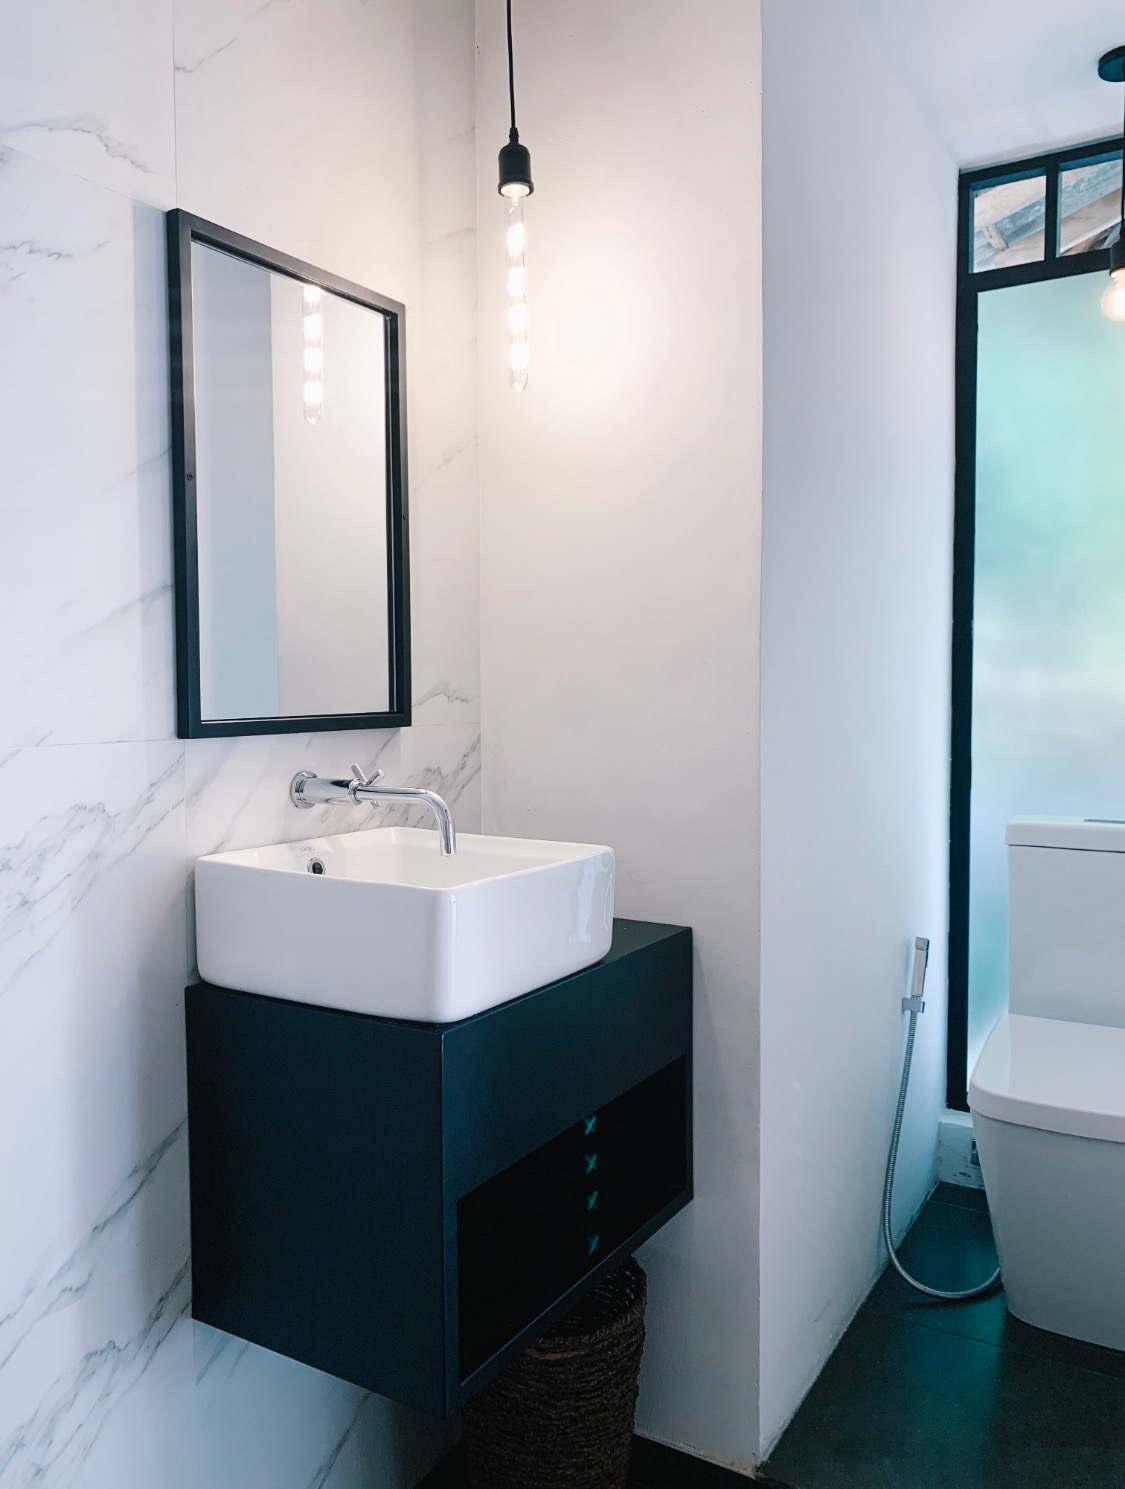 earthlinks srilanka bathroom design clean comfy villa hotel.jpg